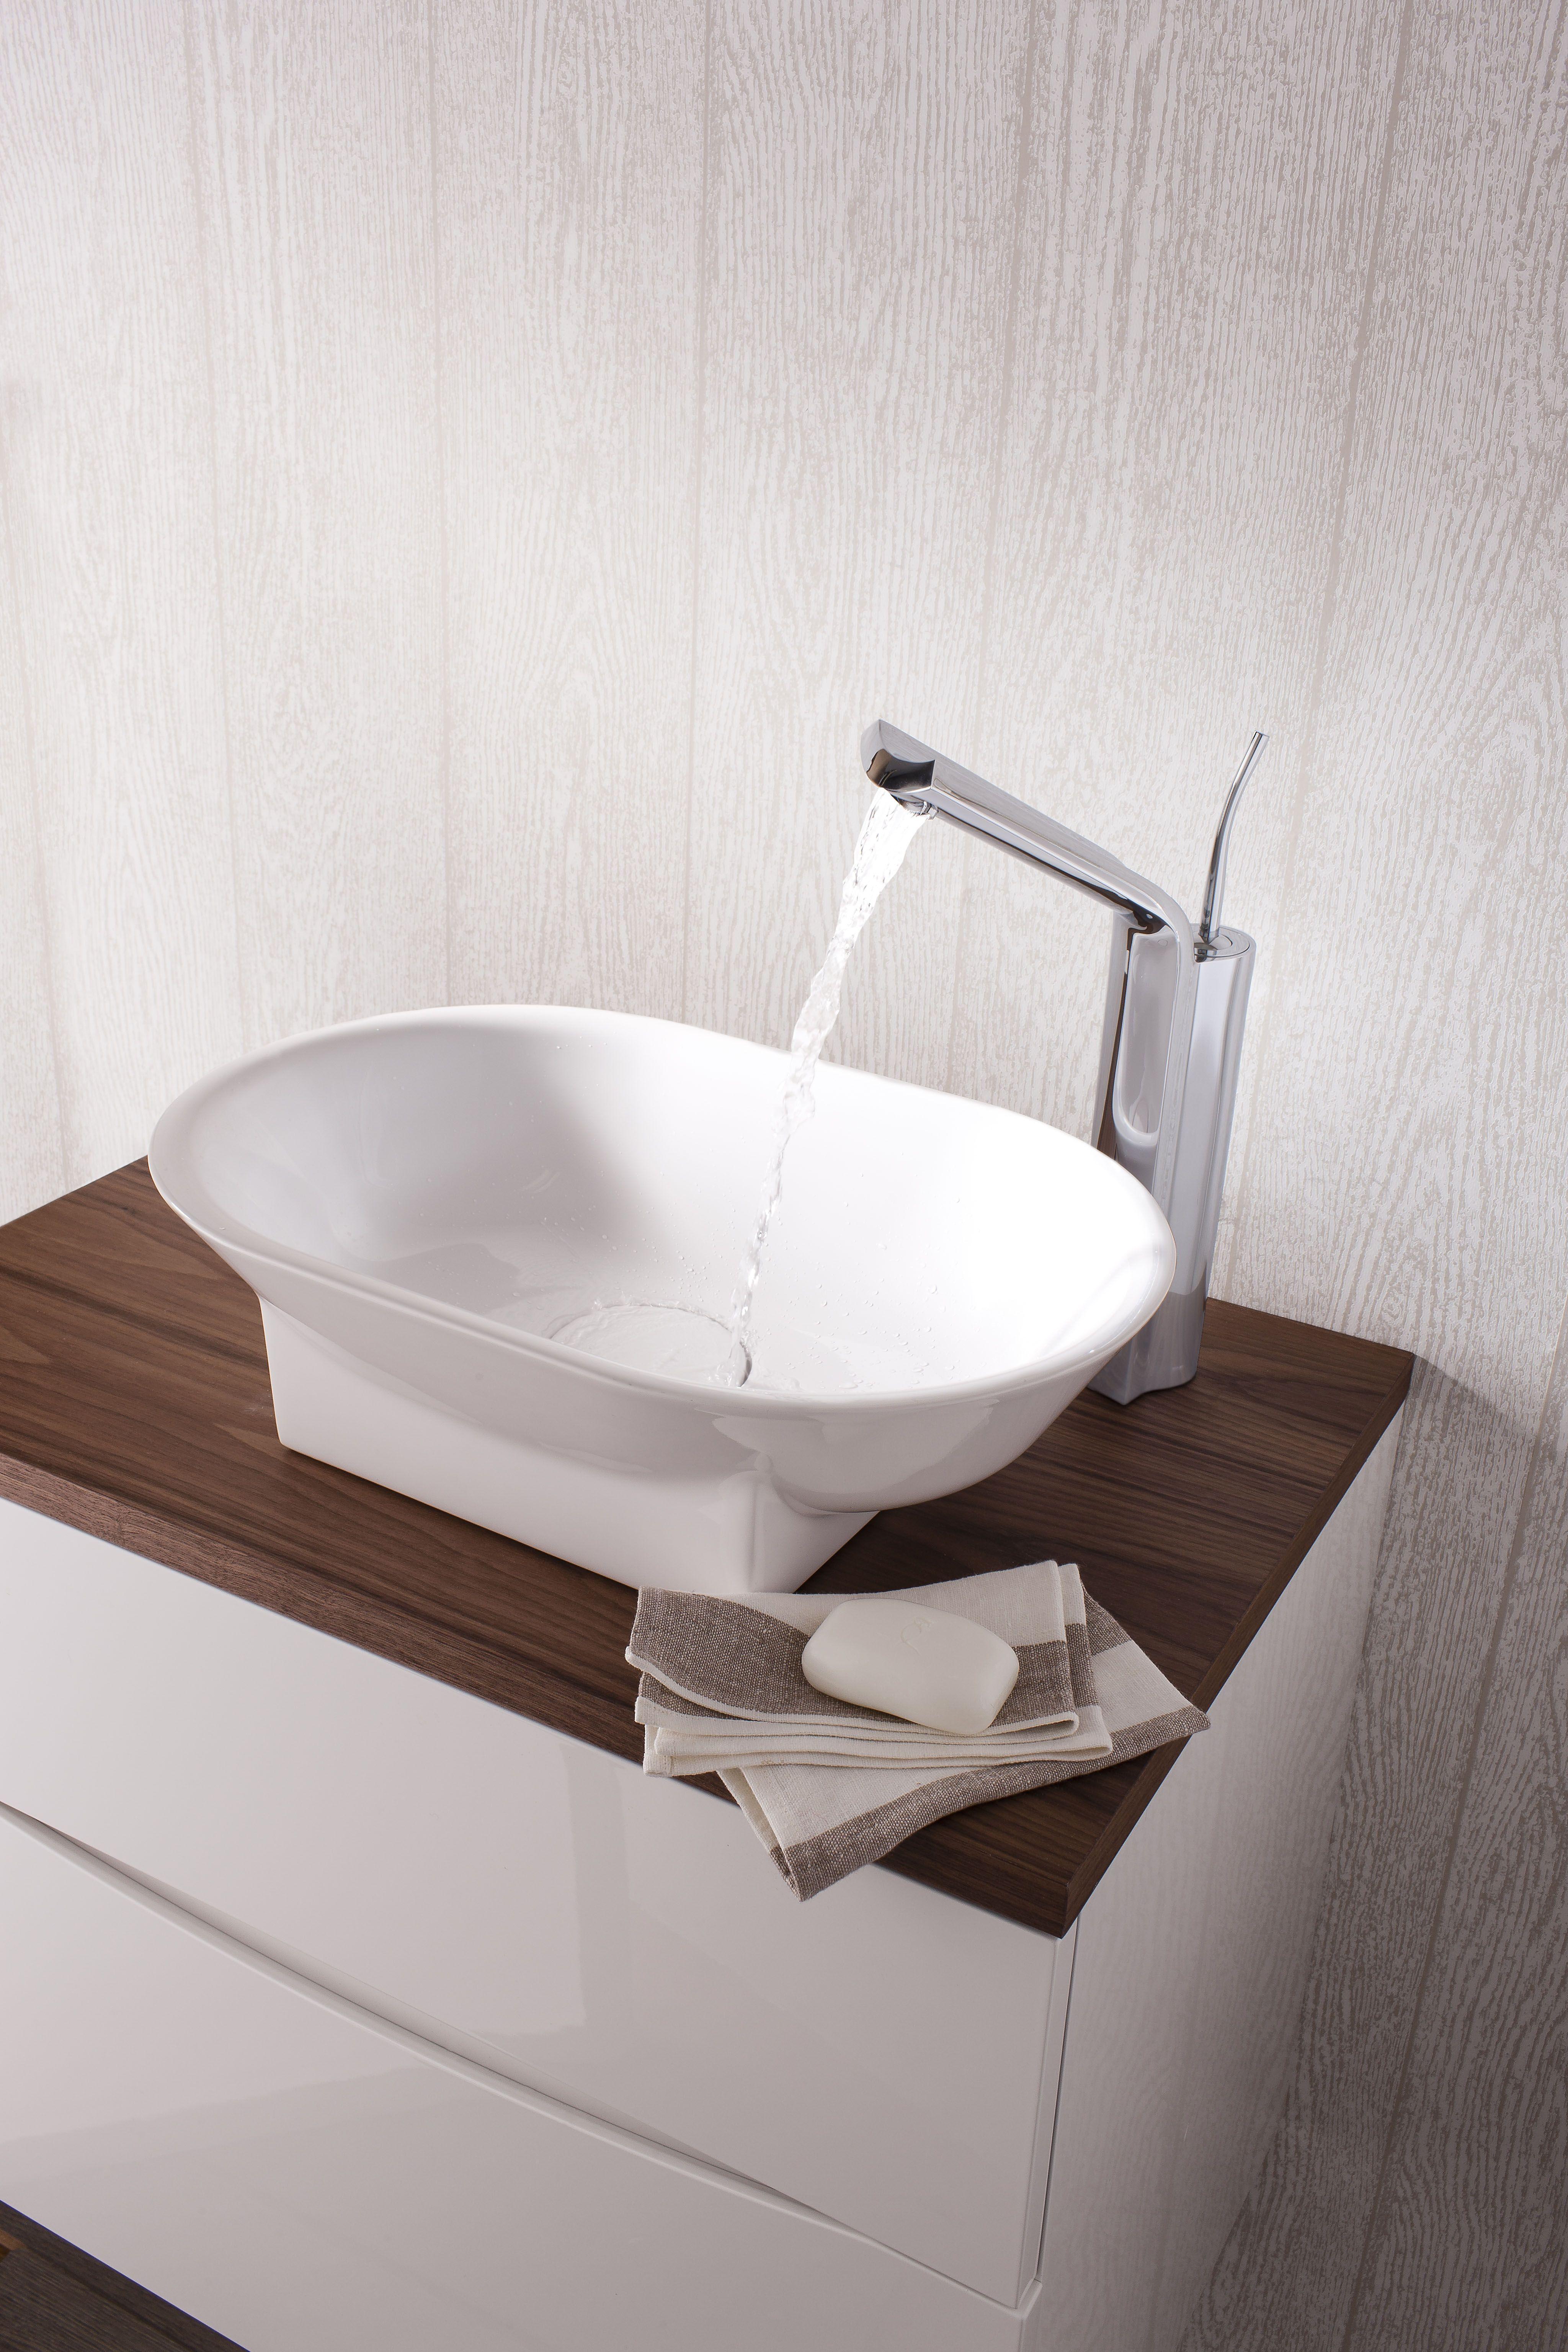 Was Ist Ein Bauhaus daytona countertop bathroom basin from crosswater http bauhaus